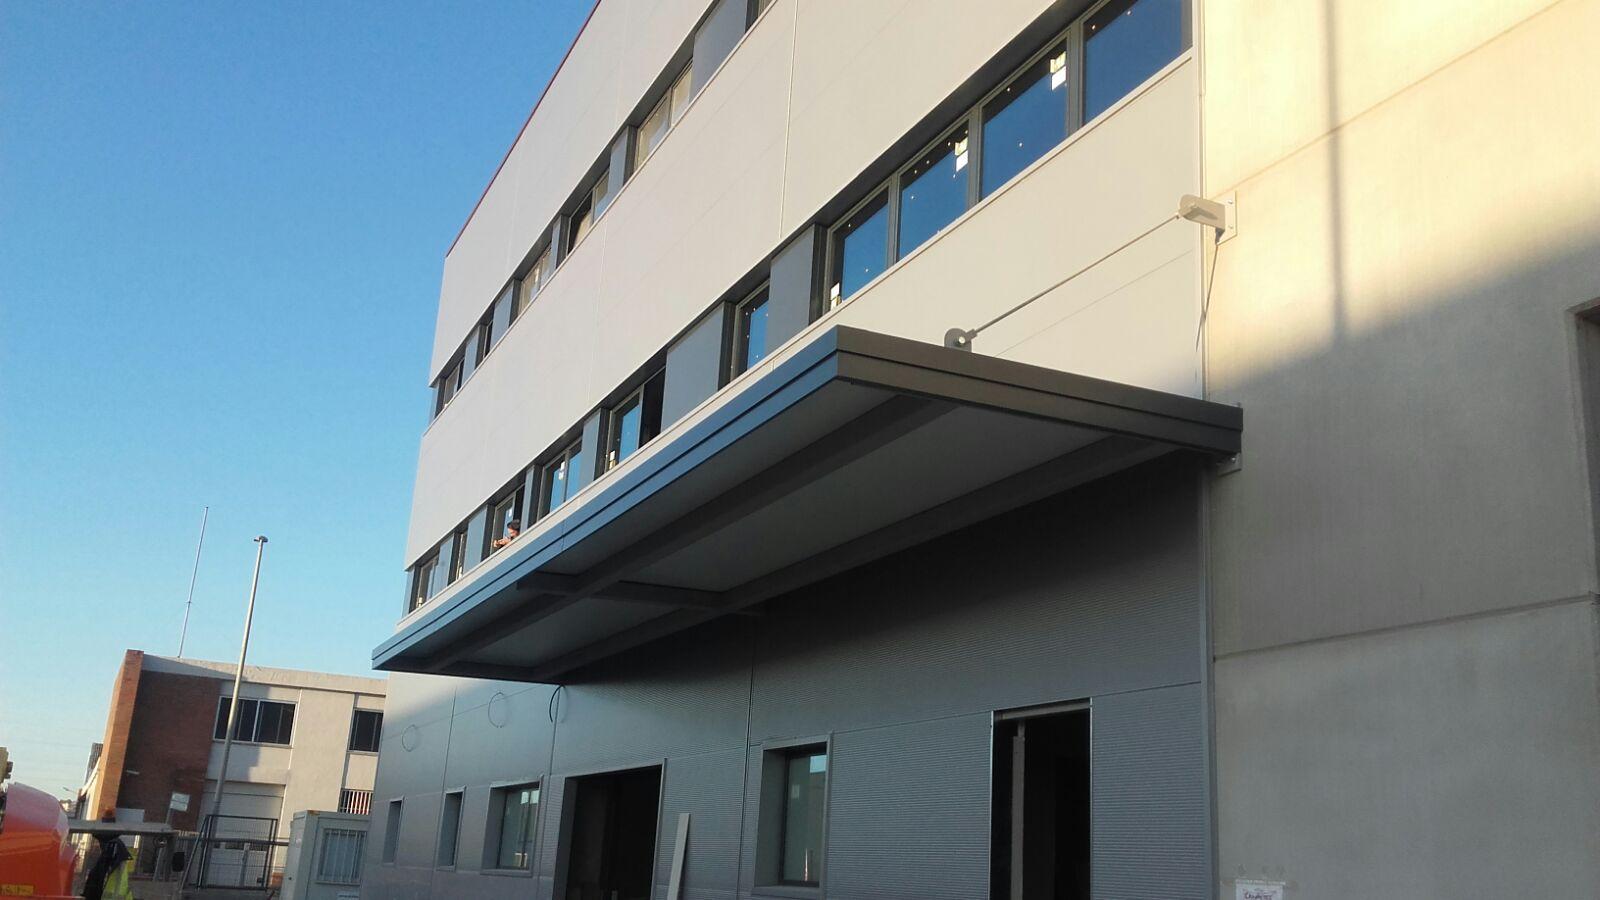 NAU-OFICINES- ST FELIU DE LLOBREGAT